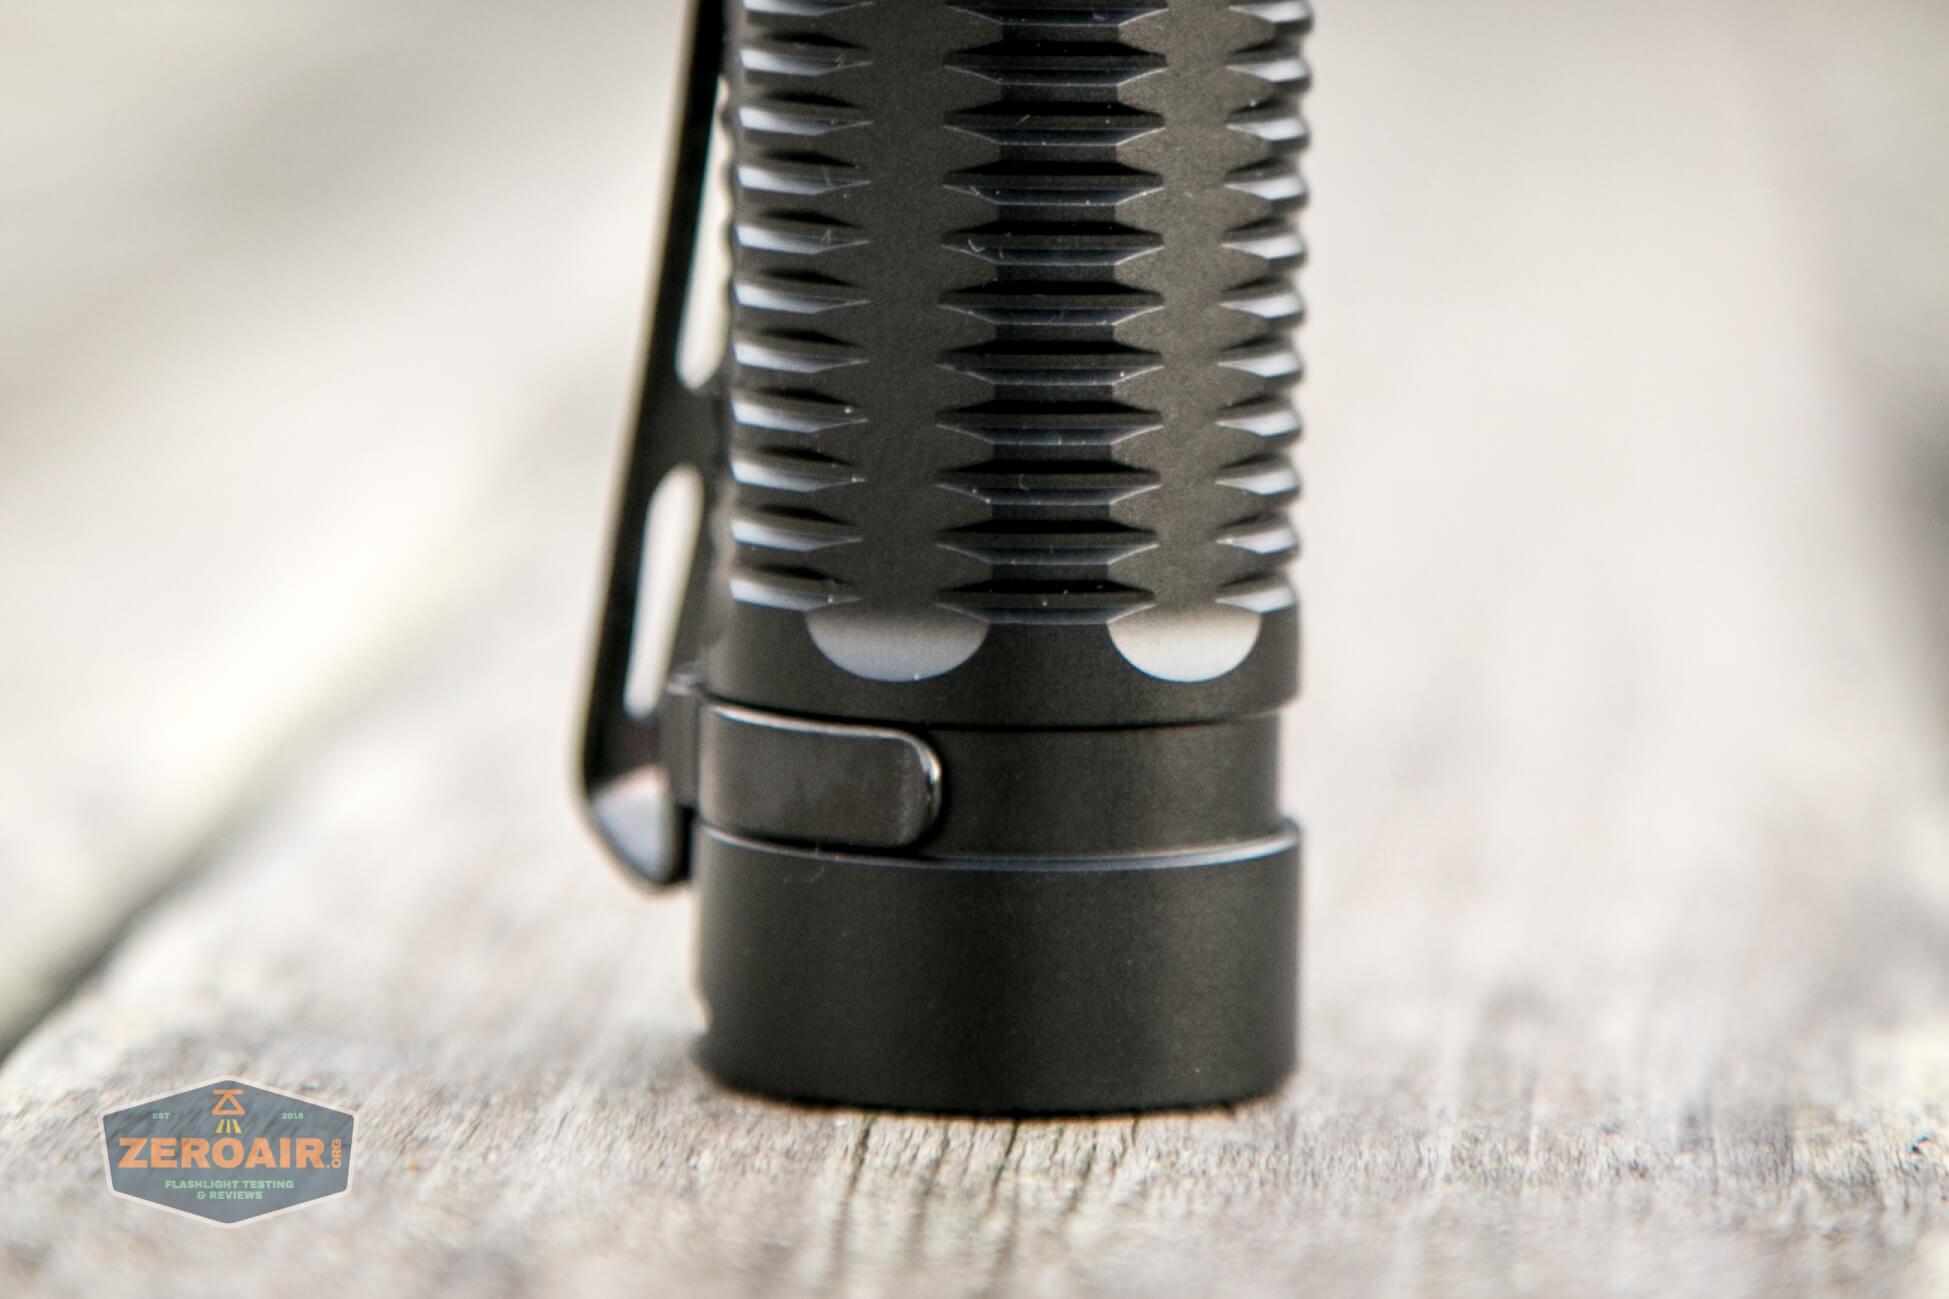 klarus g25 21700 cree xhp70.2 flashlight body and tail